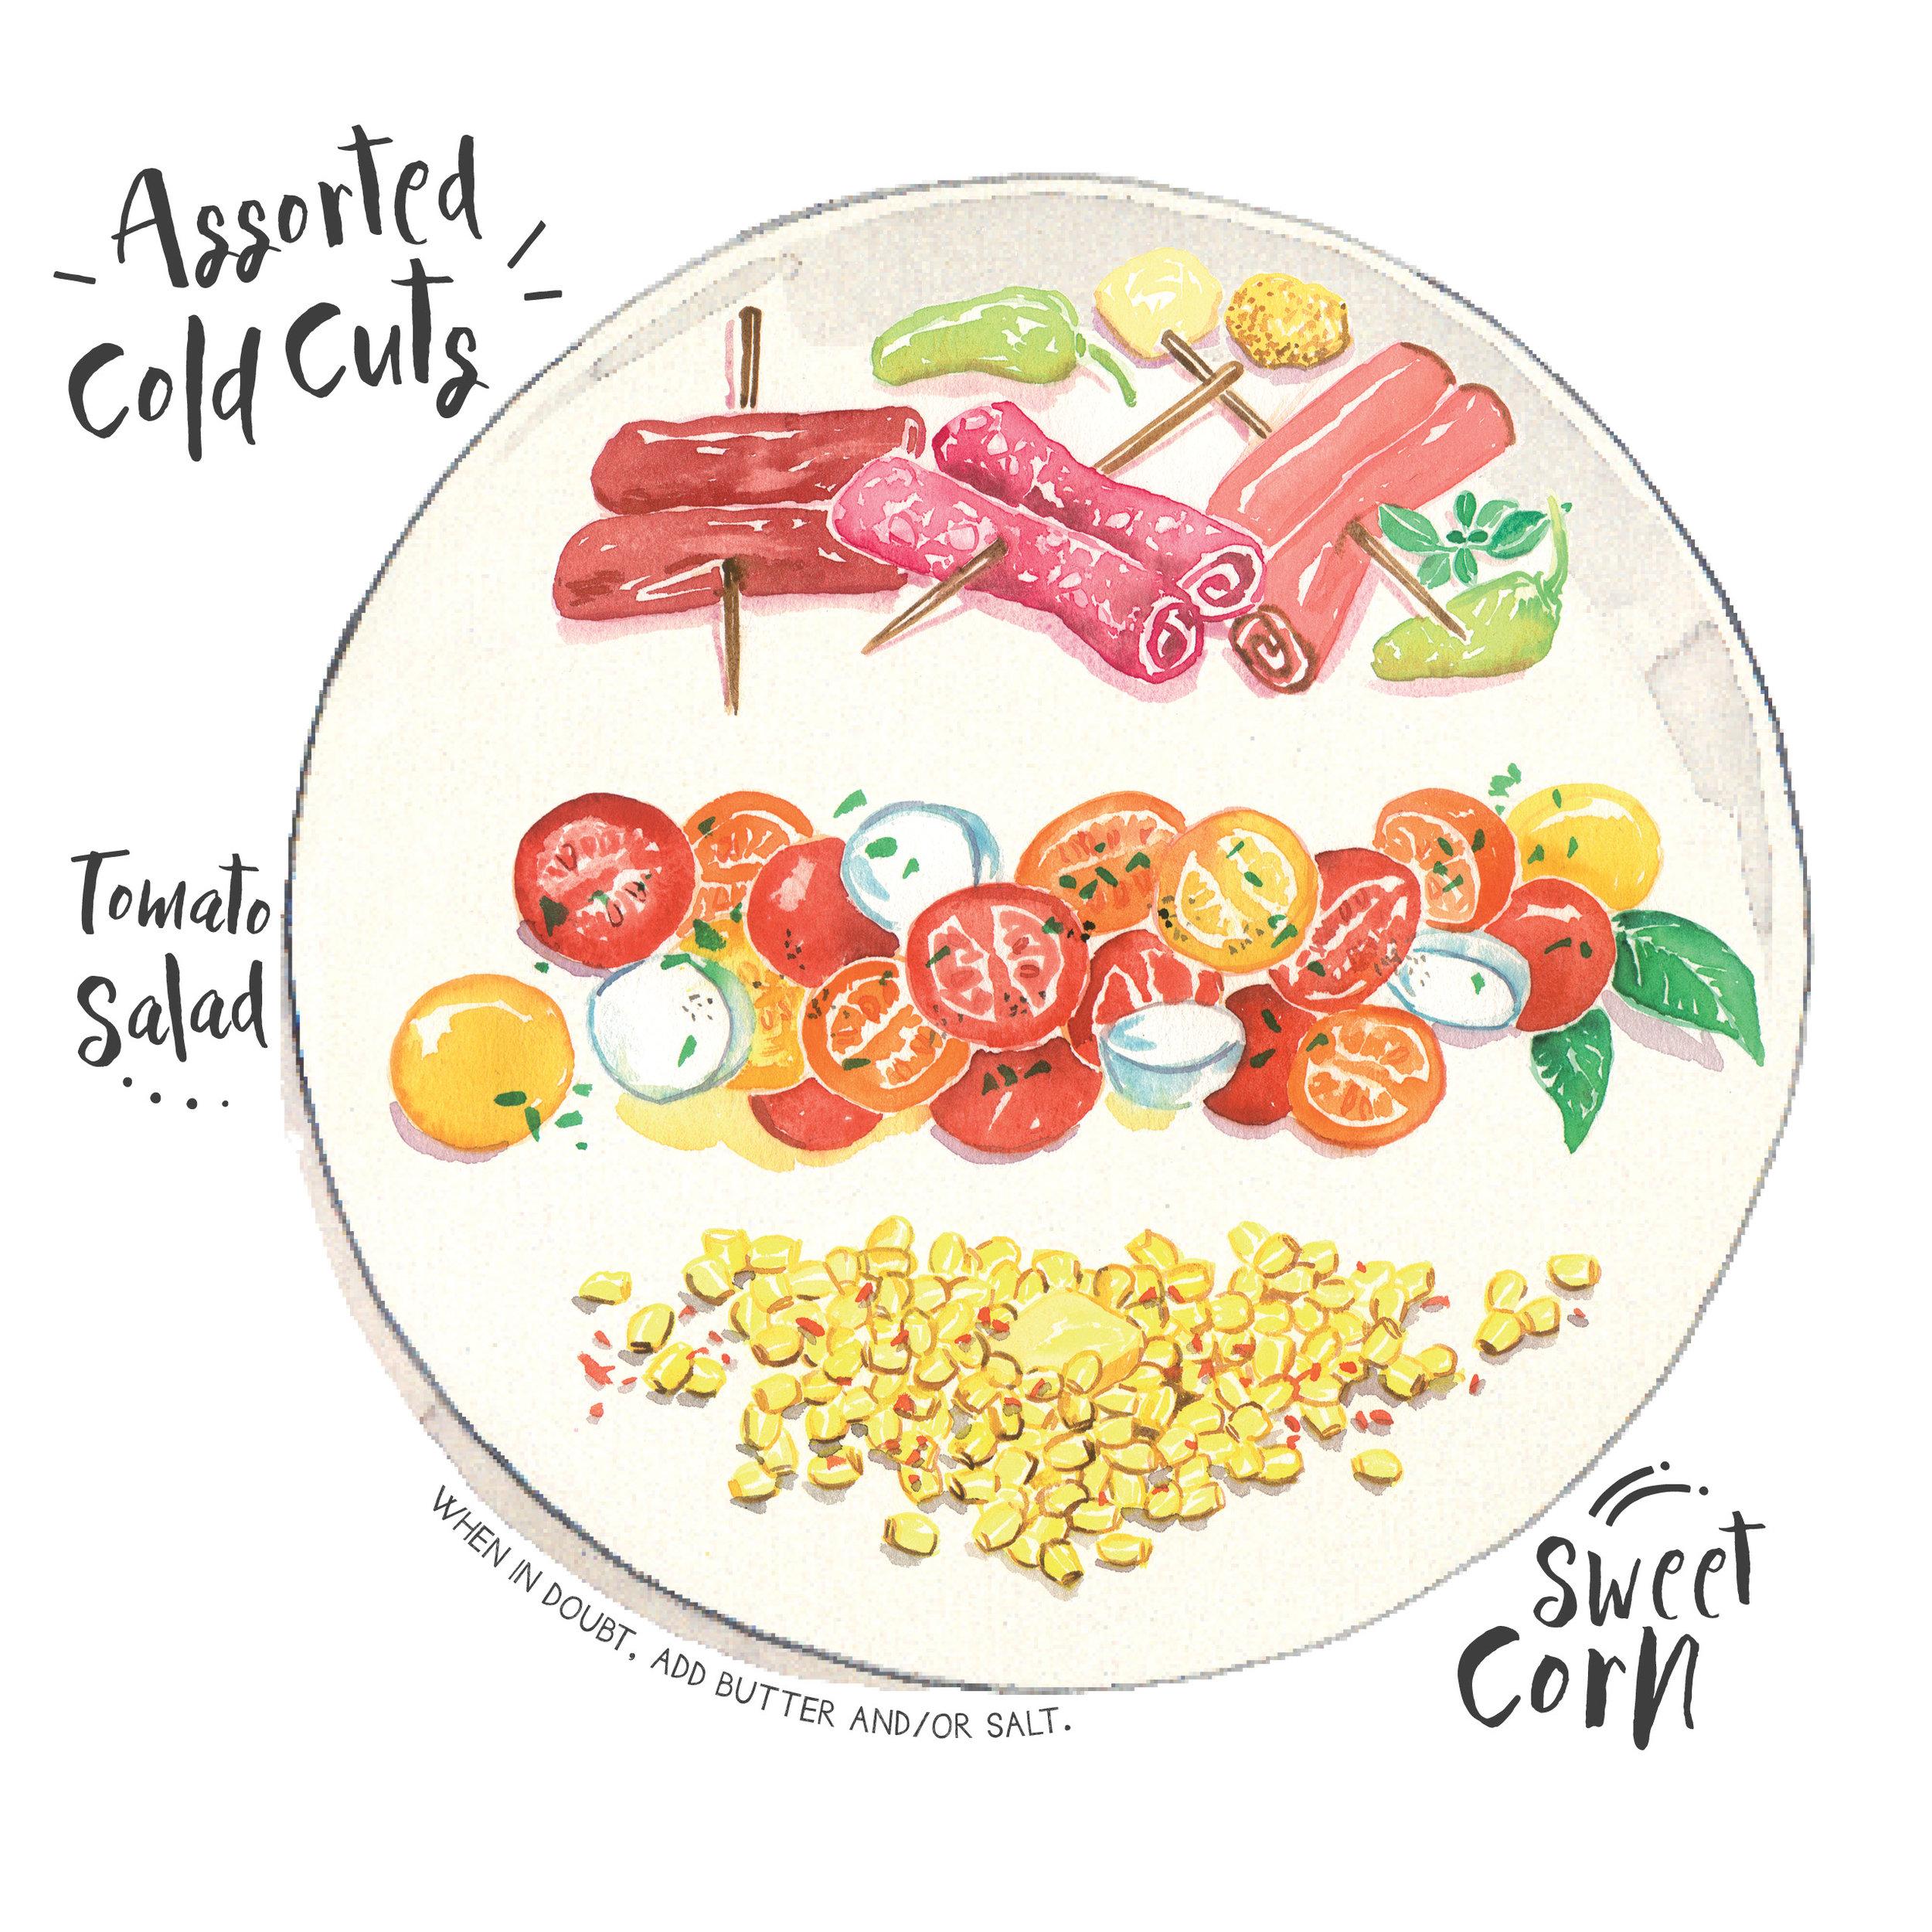 cold cuts tomato salad sweet corn.jpg